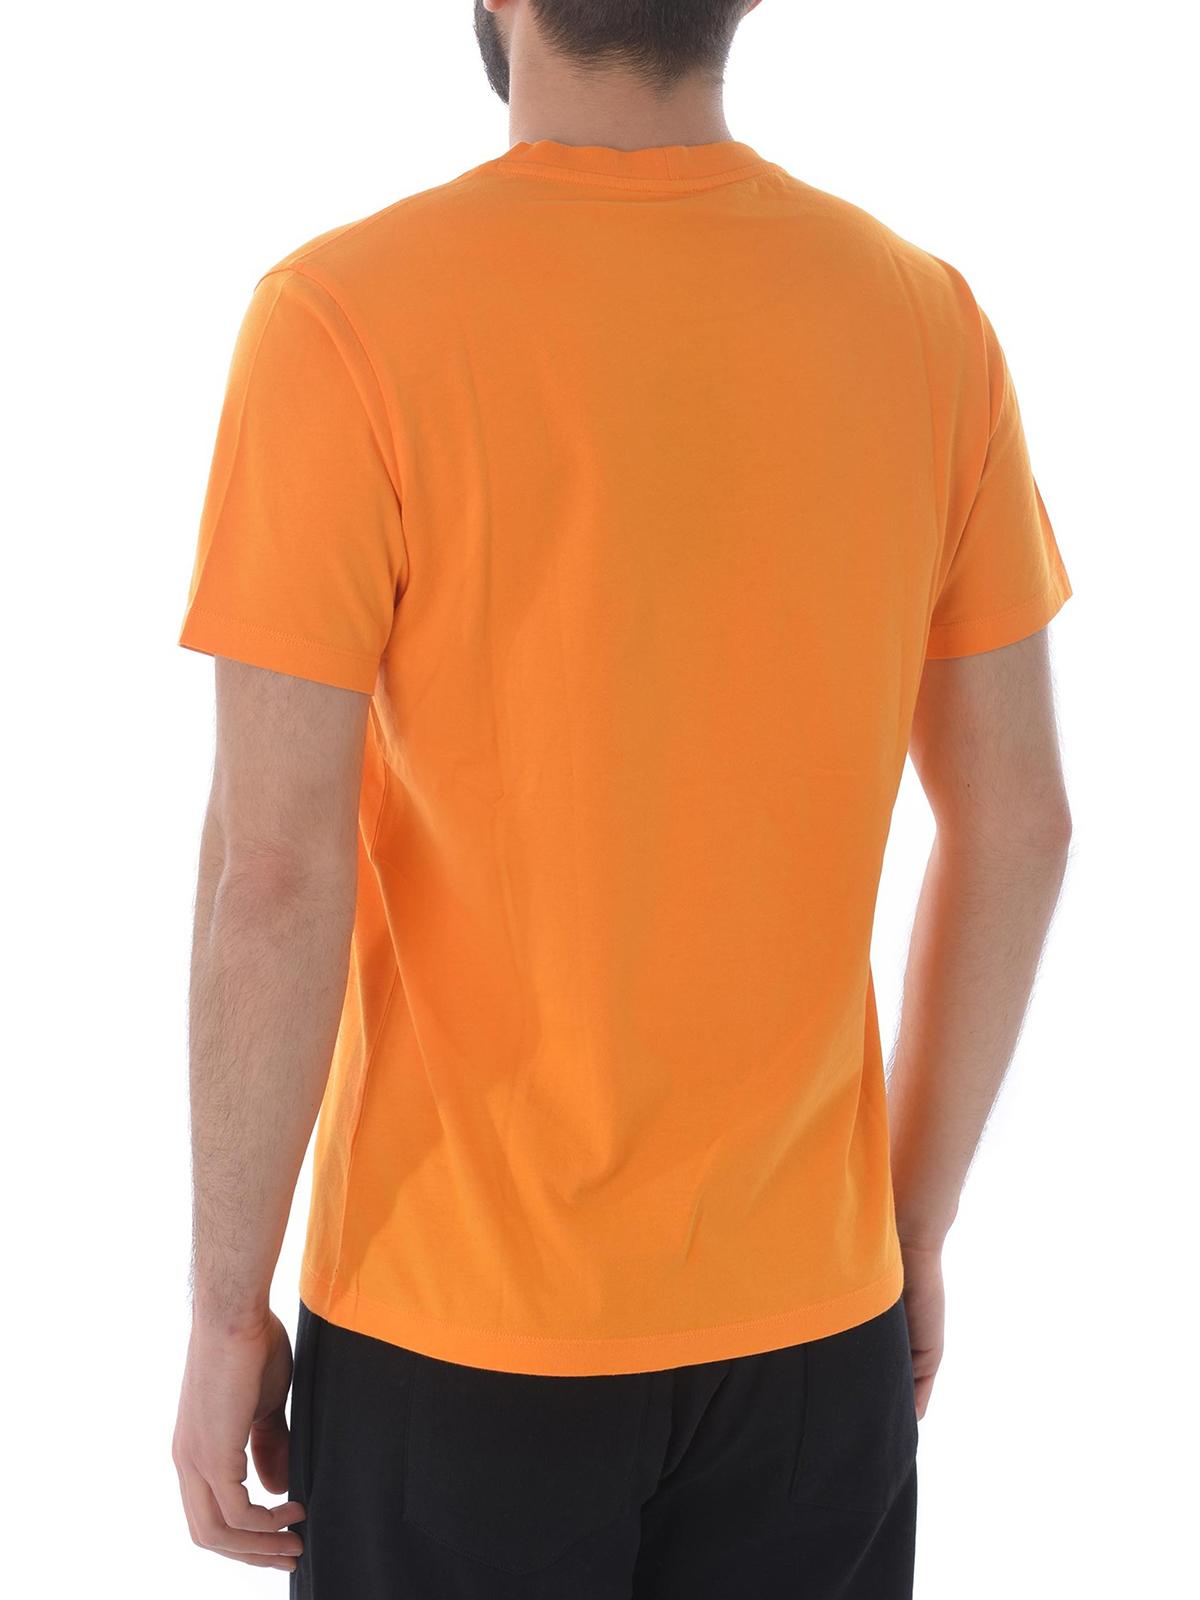 4a095b984 Kenzo - Orange cotton Tiger print T-shirt - t-shirts - F955TS0504YA 17